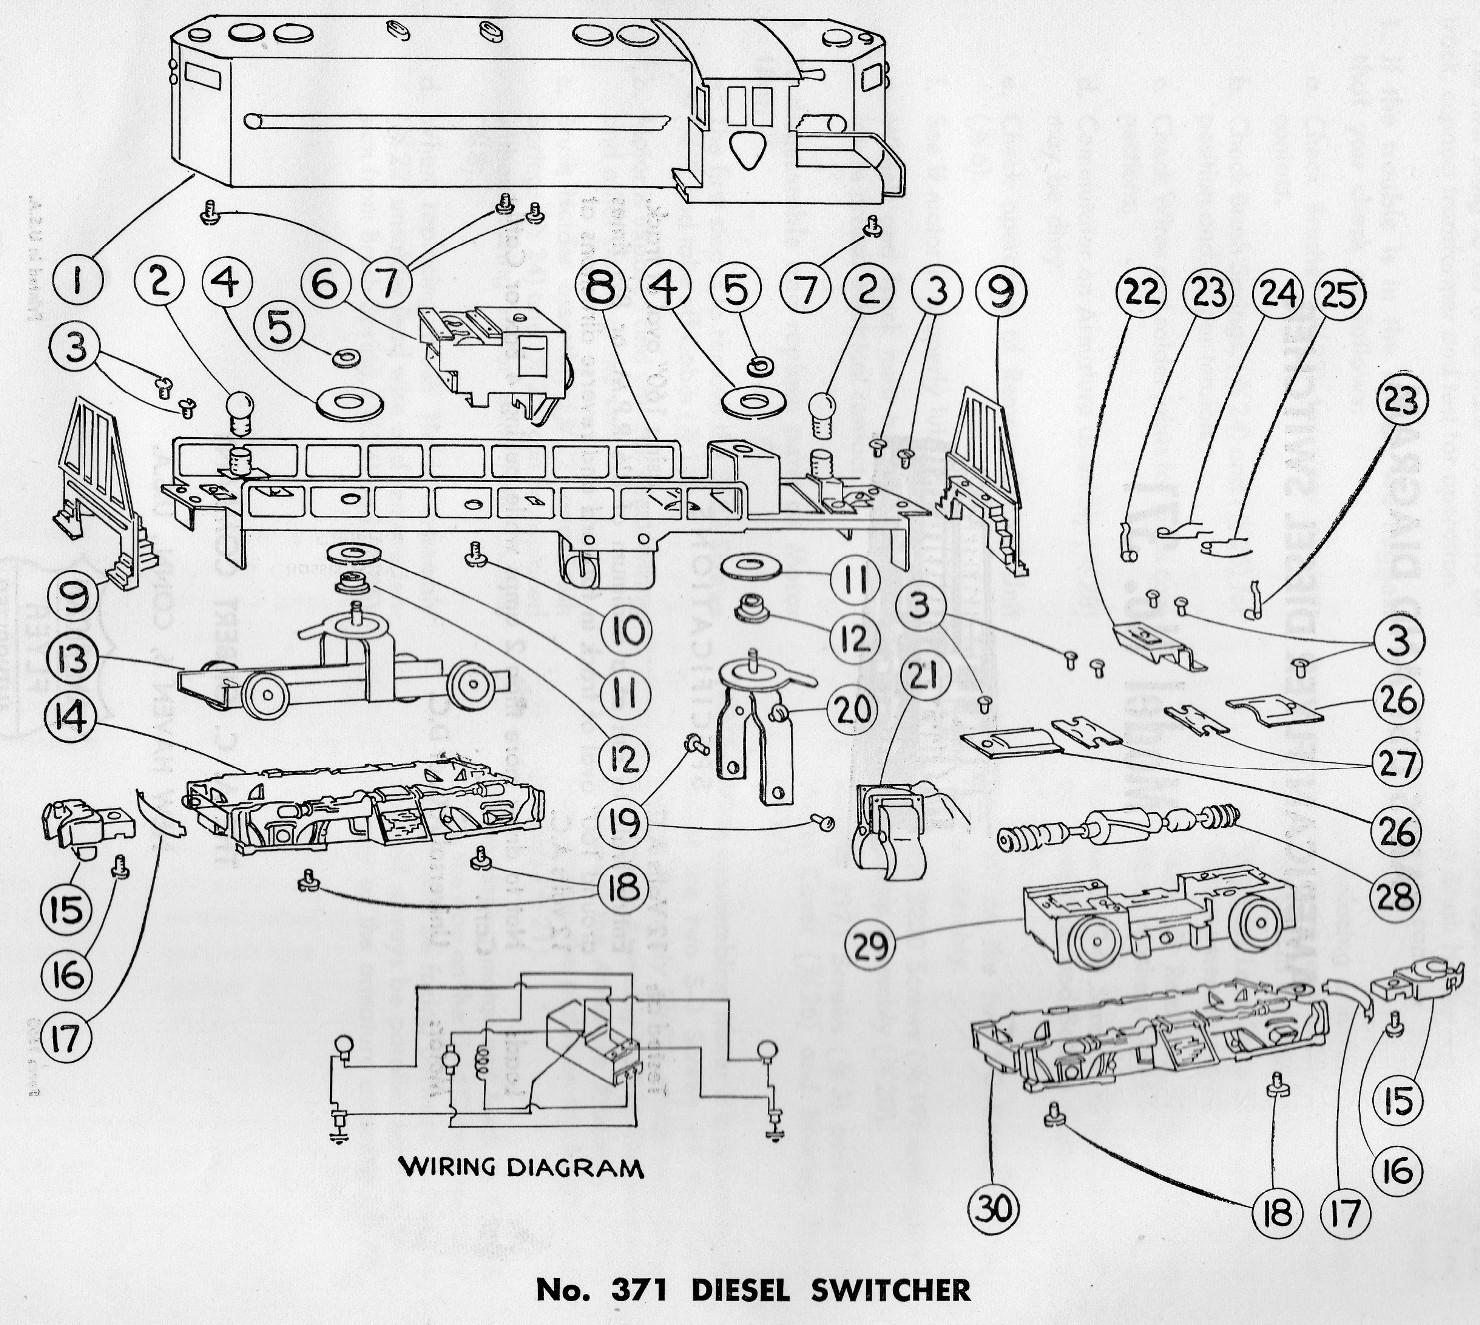 American Flyer Locomotive Wiring Diagrams American Flyer Diesel Switcher 371 Parts List Amp Diagram